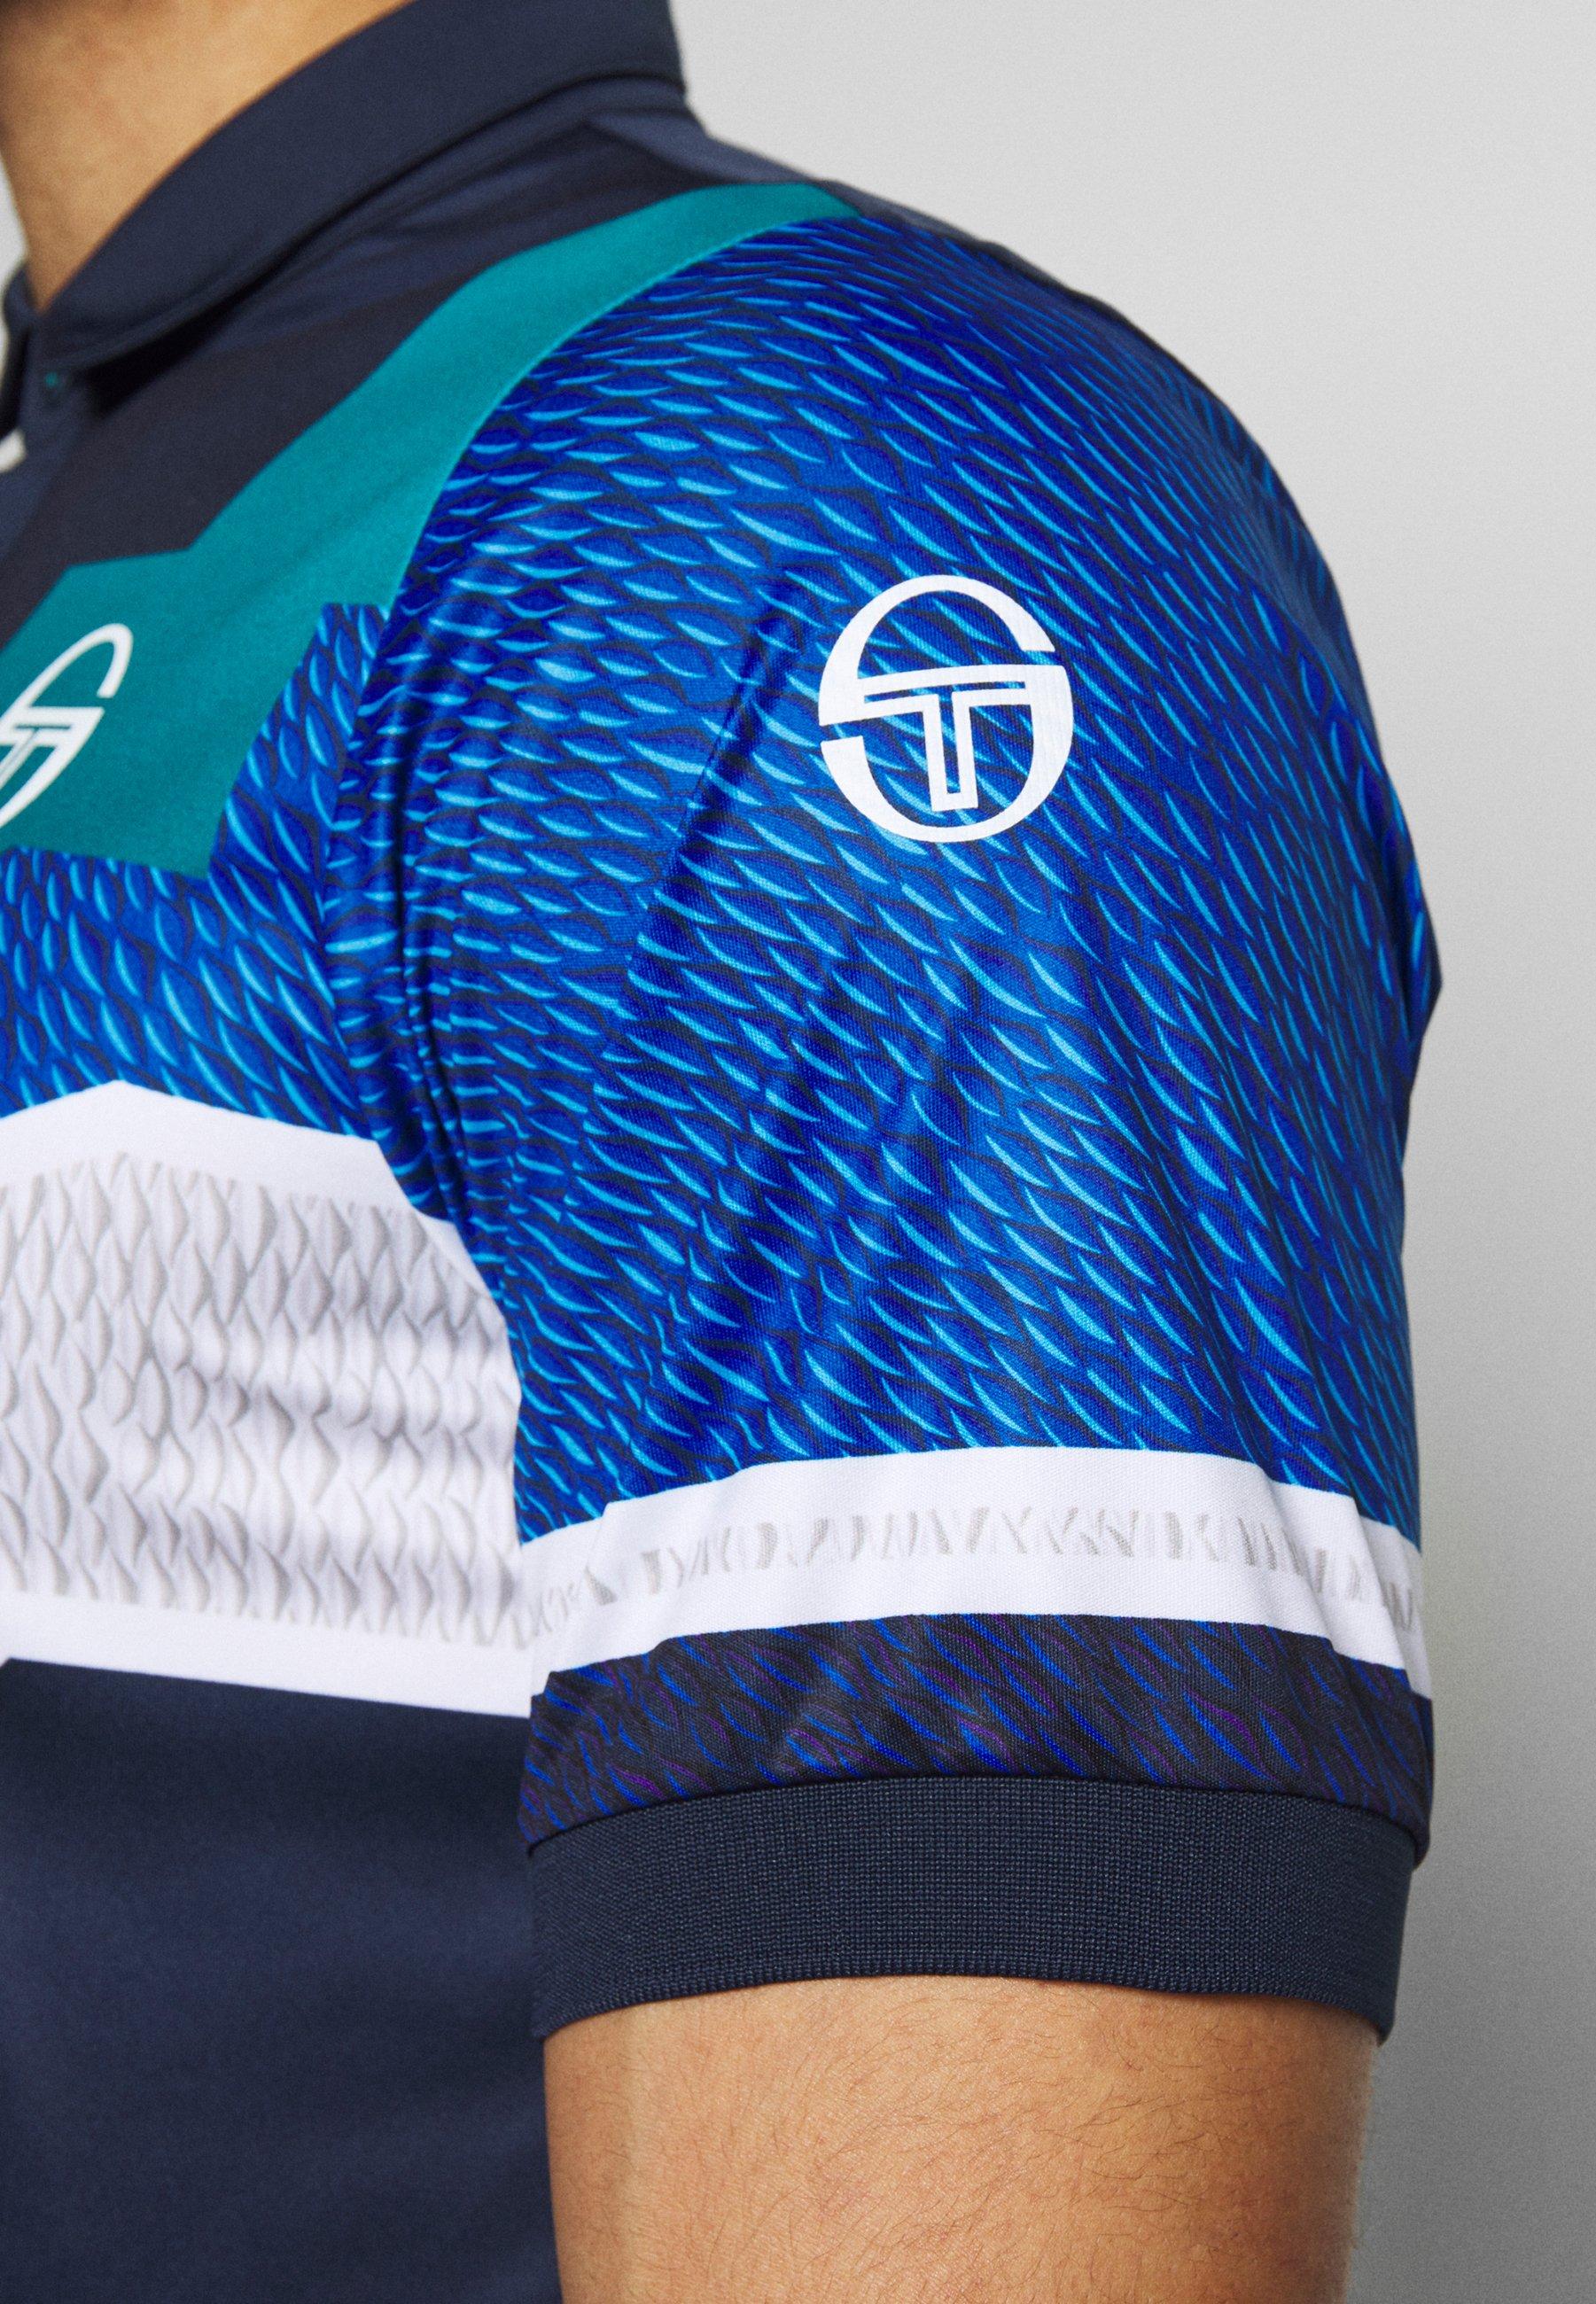 sergio tacchini T-shirt de sport - navy/royal